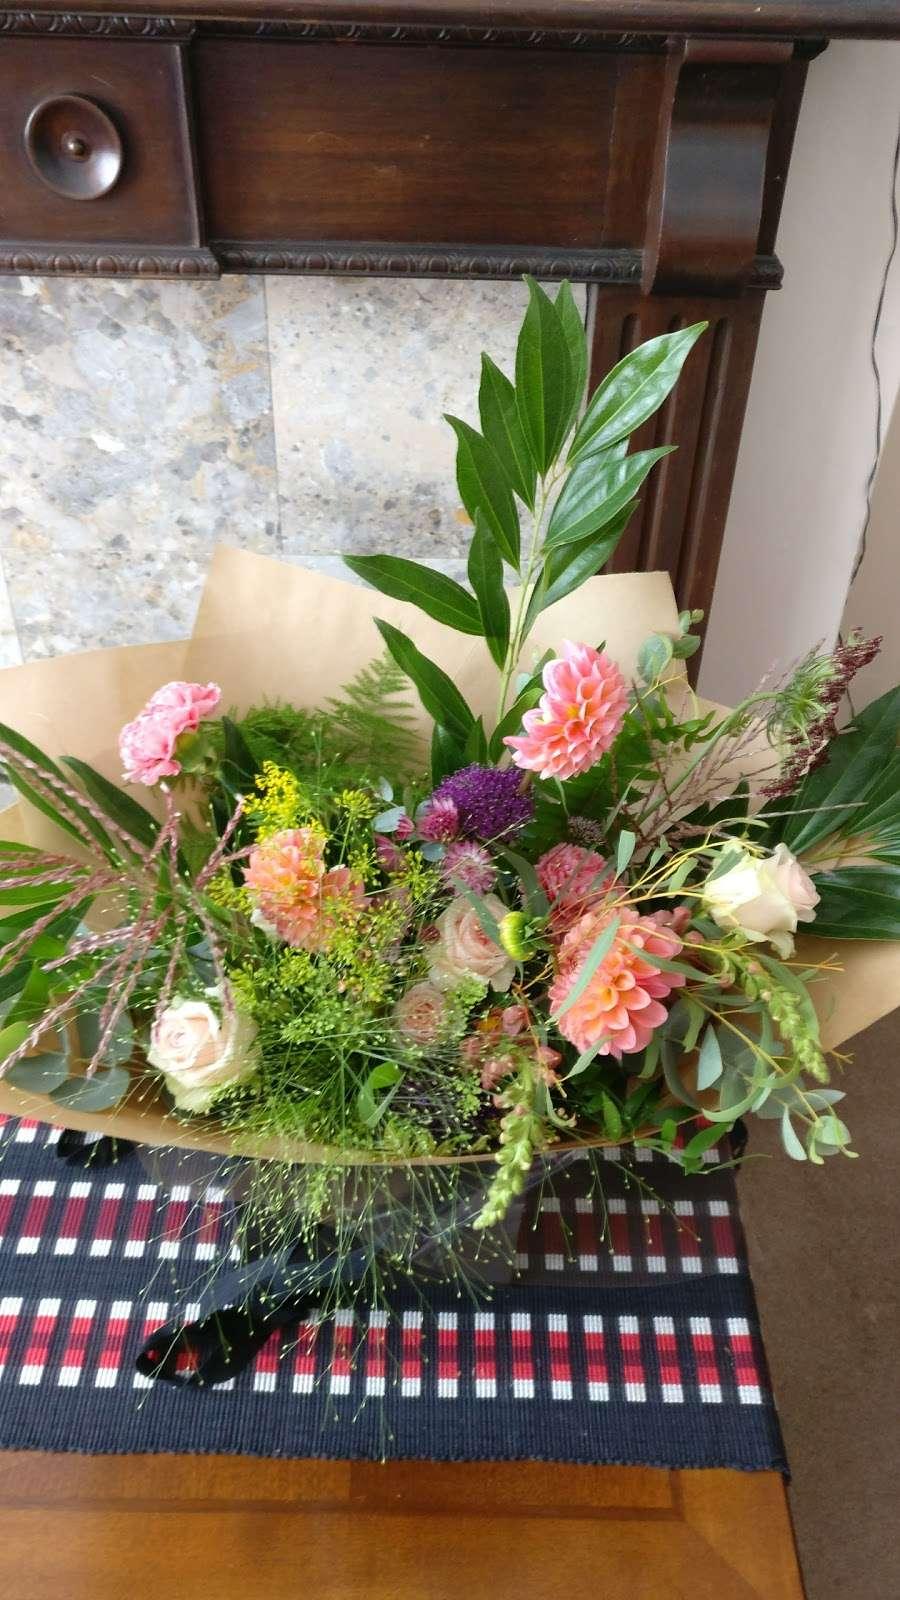 Grace and Thorn - florist  | Photo 9 of 10 | Address: 338 Hackney Rd, London E2 7AX, UK | Phone: 020 7739 1521